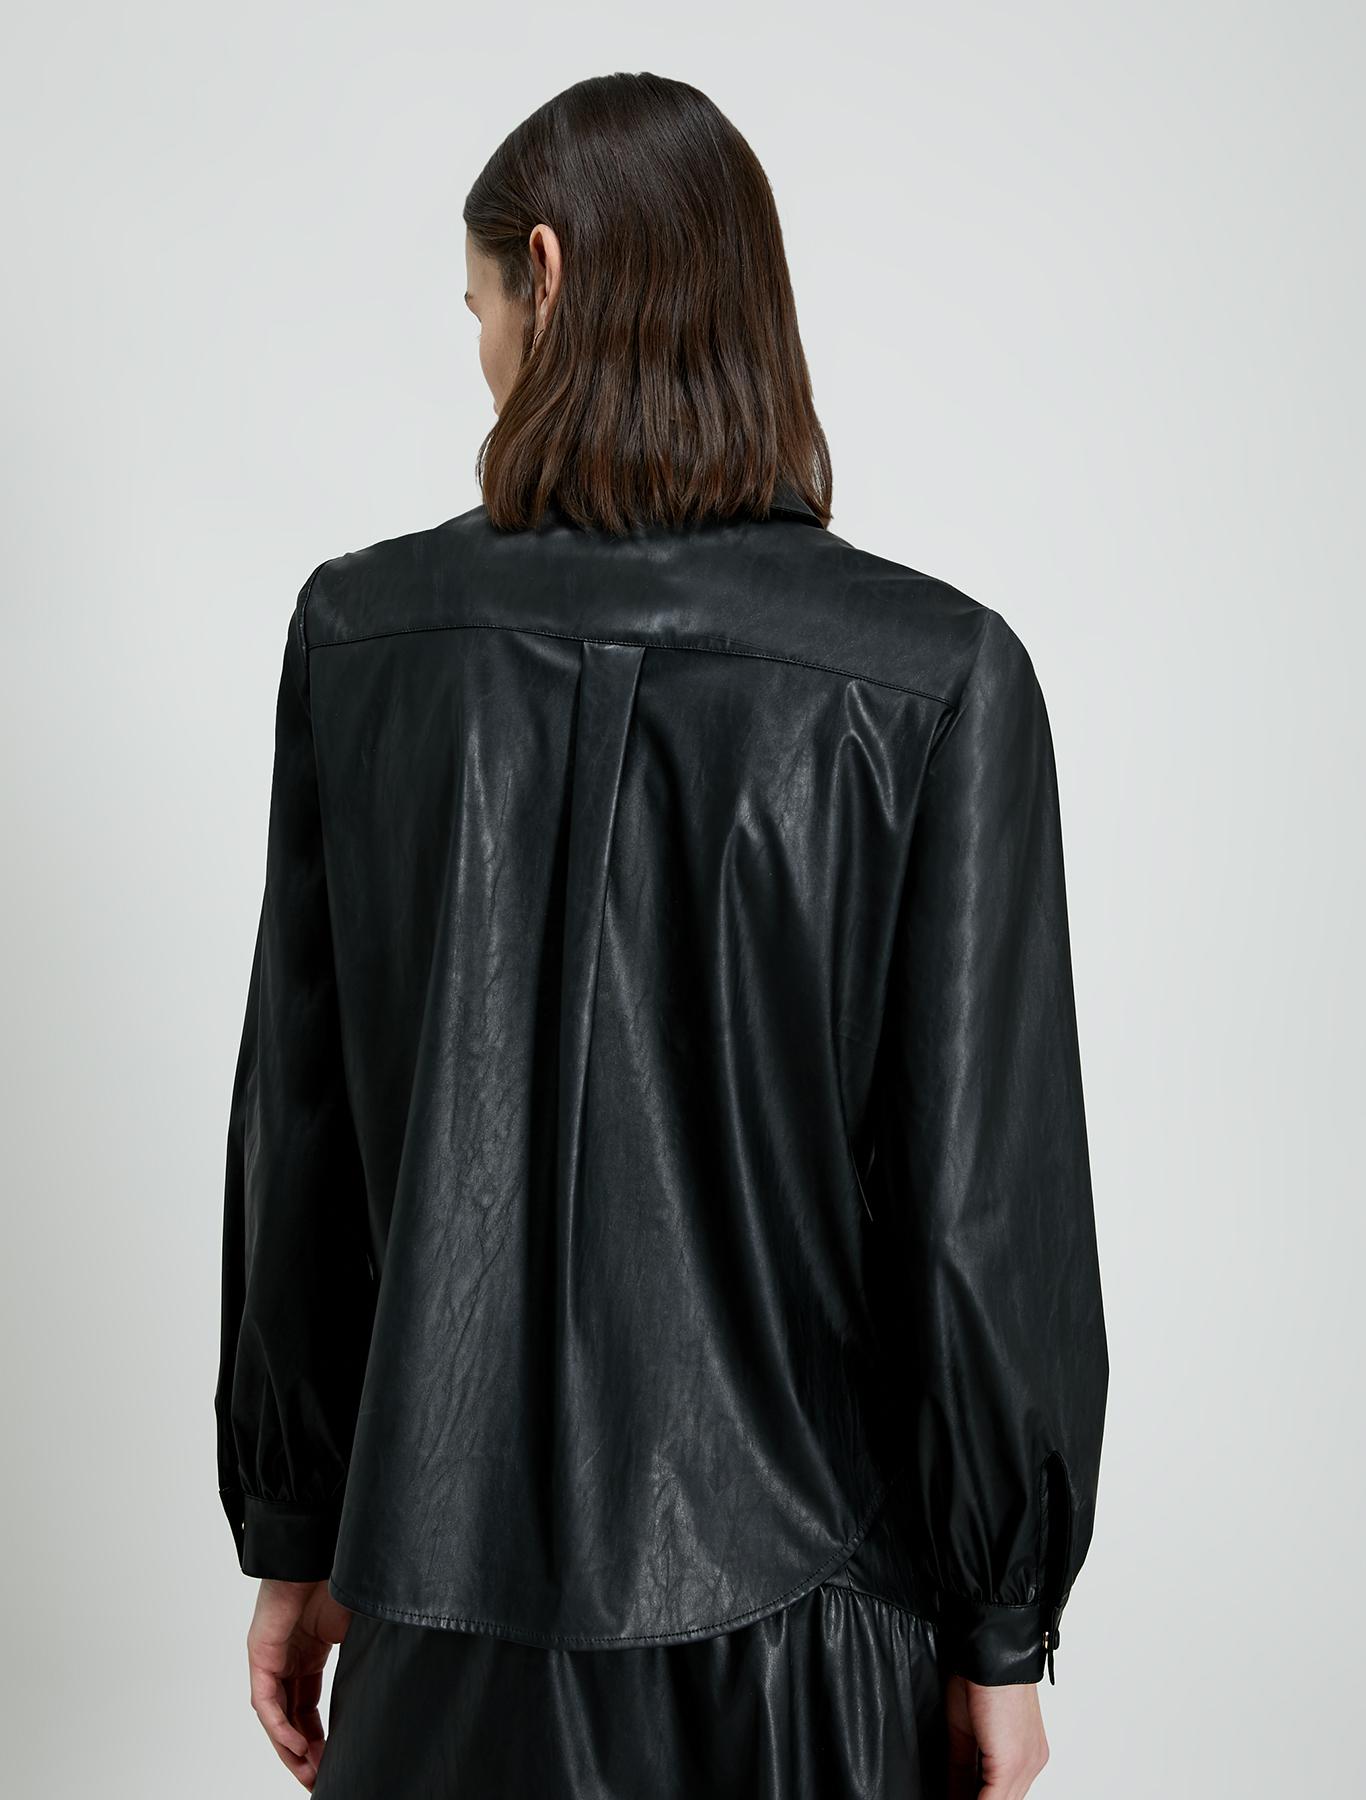 Coated jersey shirt - black - pennyblack